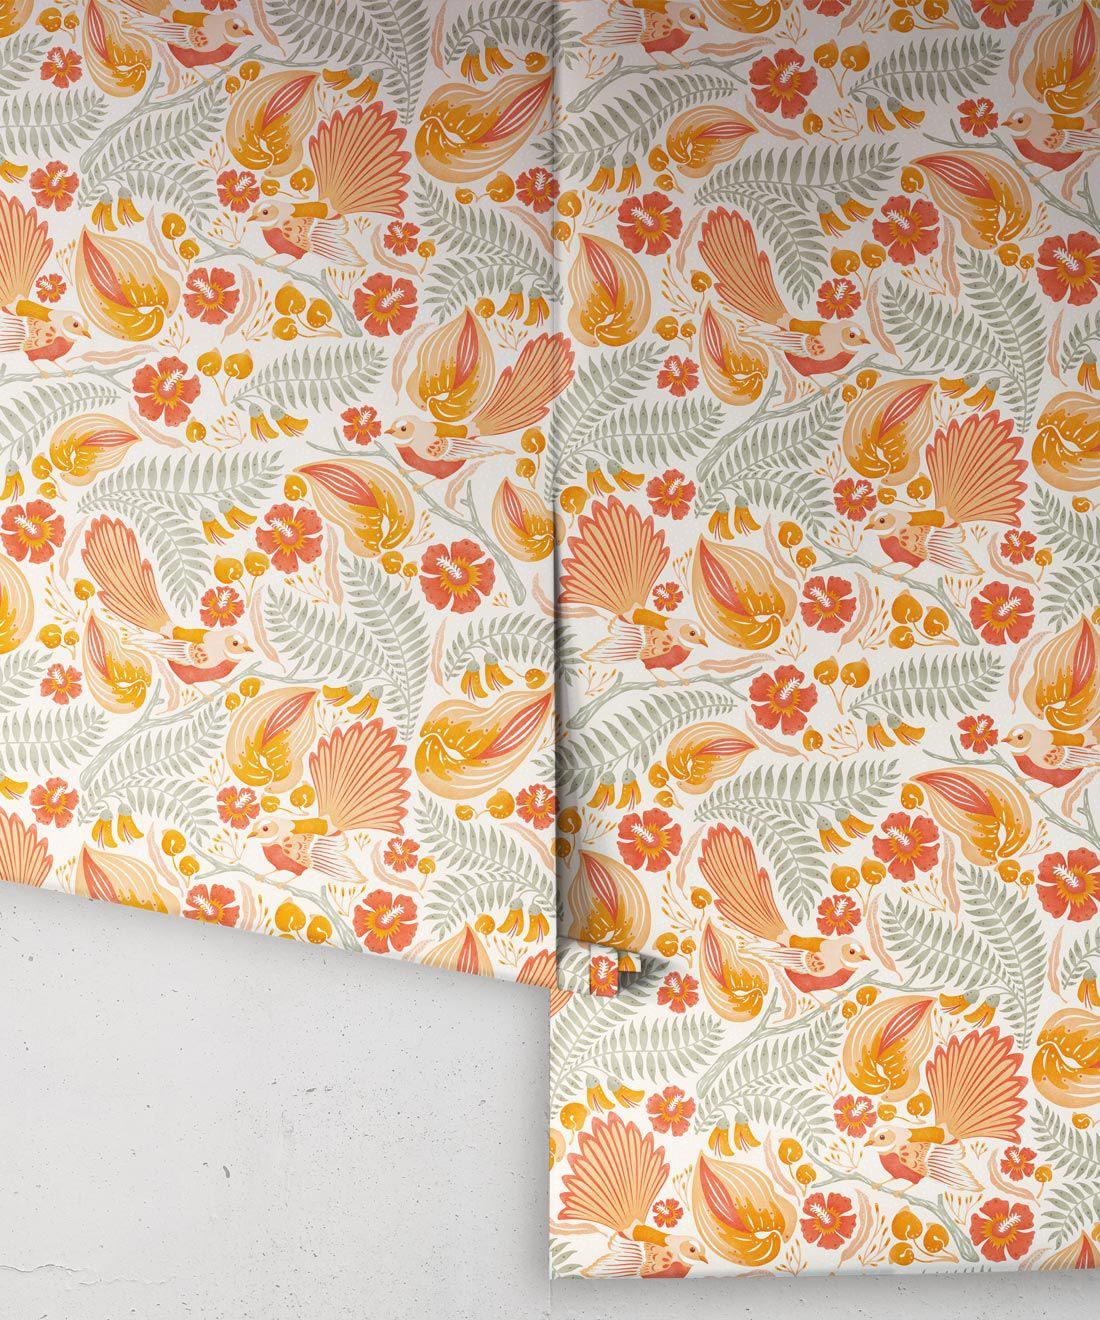 Faintails Wallpaper • New Zealand • Bird Wallpaper • Kowhai Tree • Kowhai Flowers • Orange Wallpaper • Light Colorway • Wallpaper Rolls